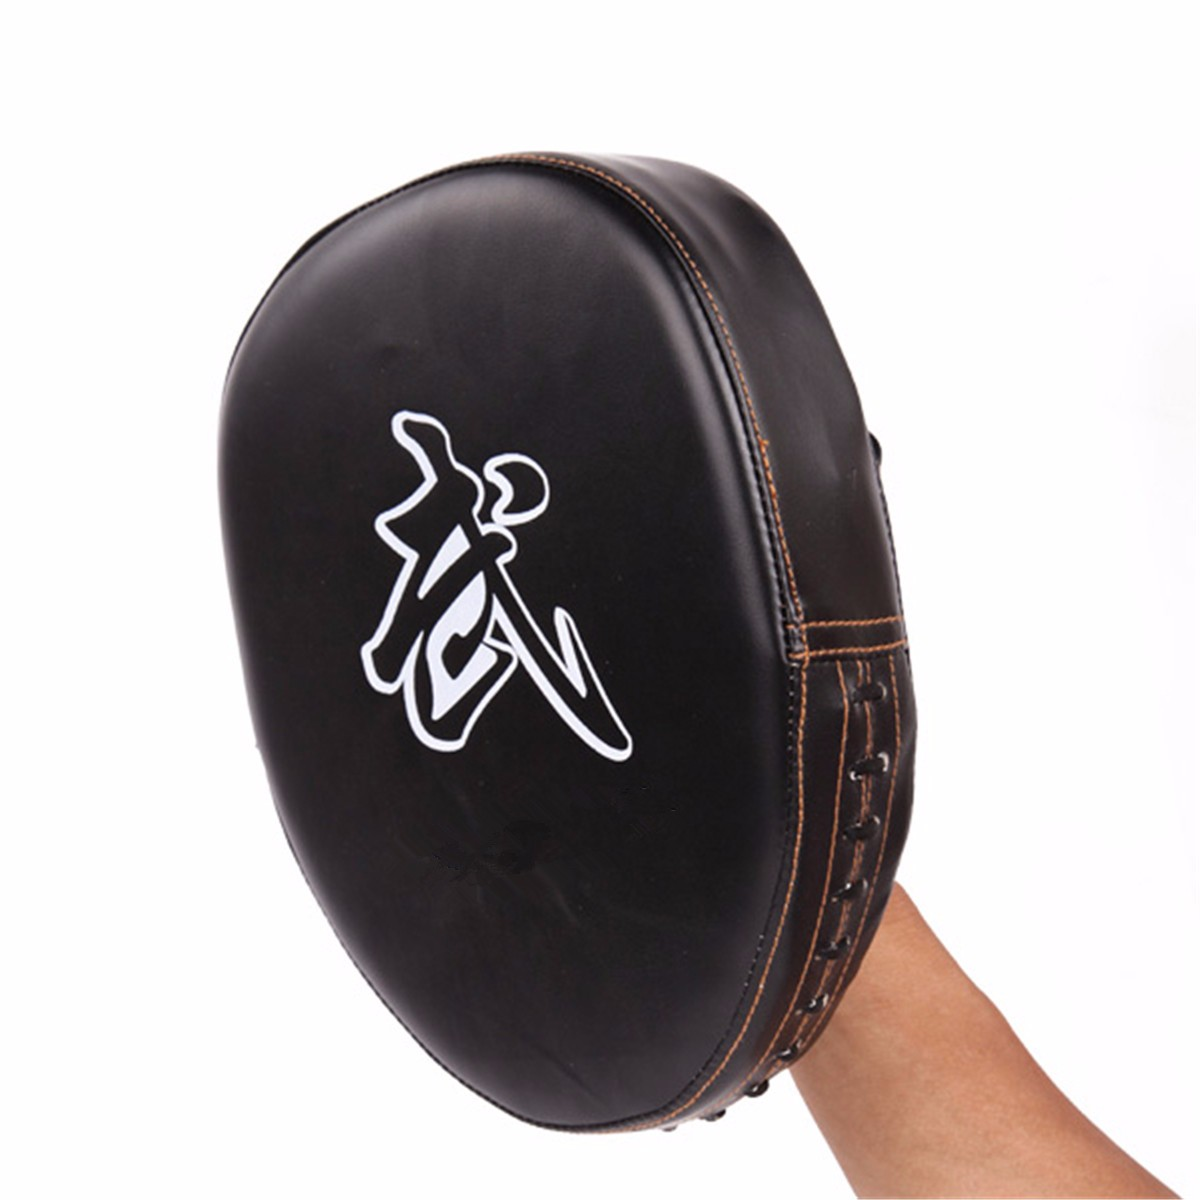 Sports Pro Boxing Mitts Training Coaching Target Pads Gloves Glve Muay Thai Kick MMA(China (Mainland))